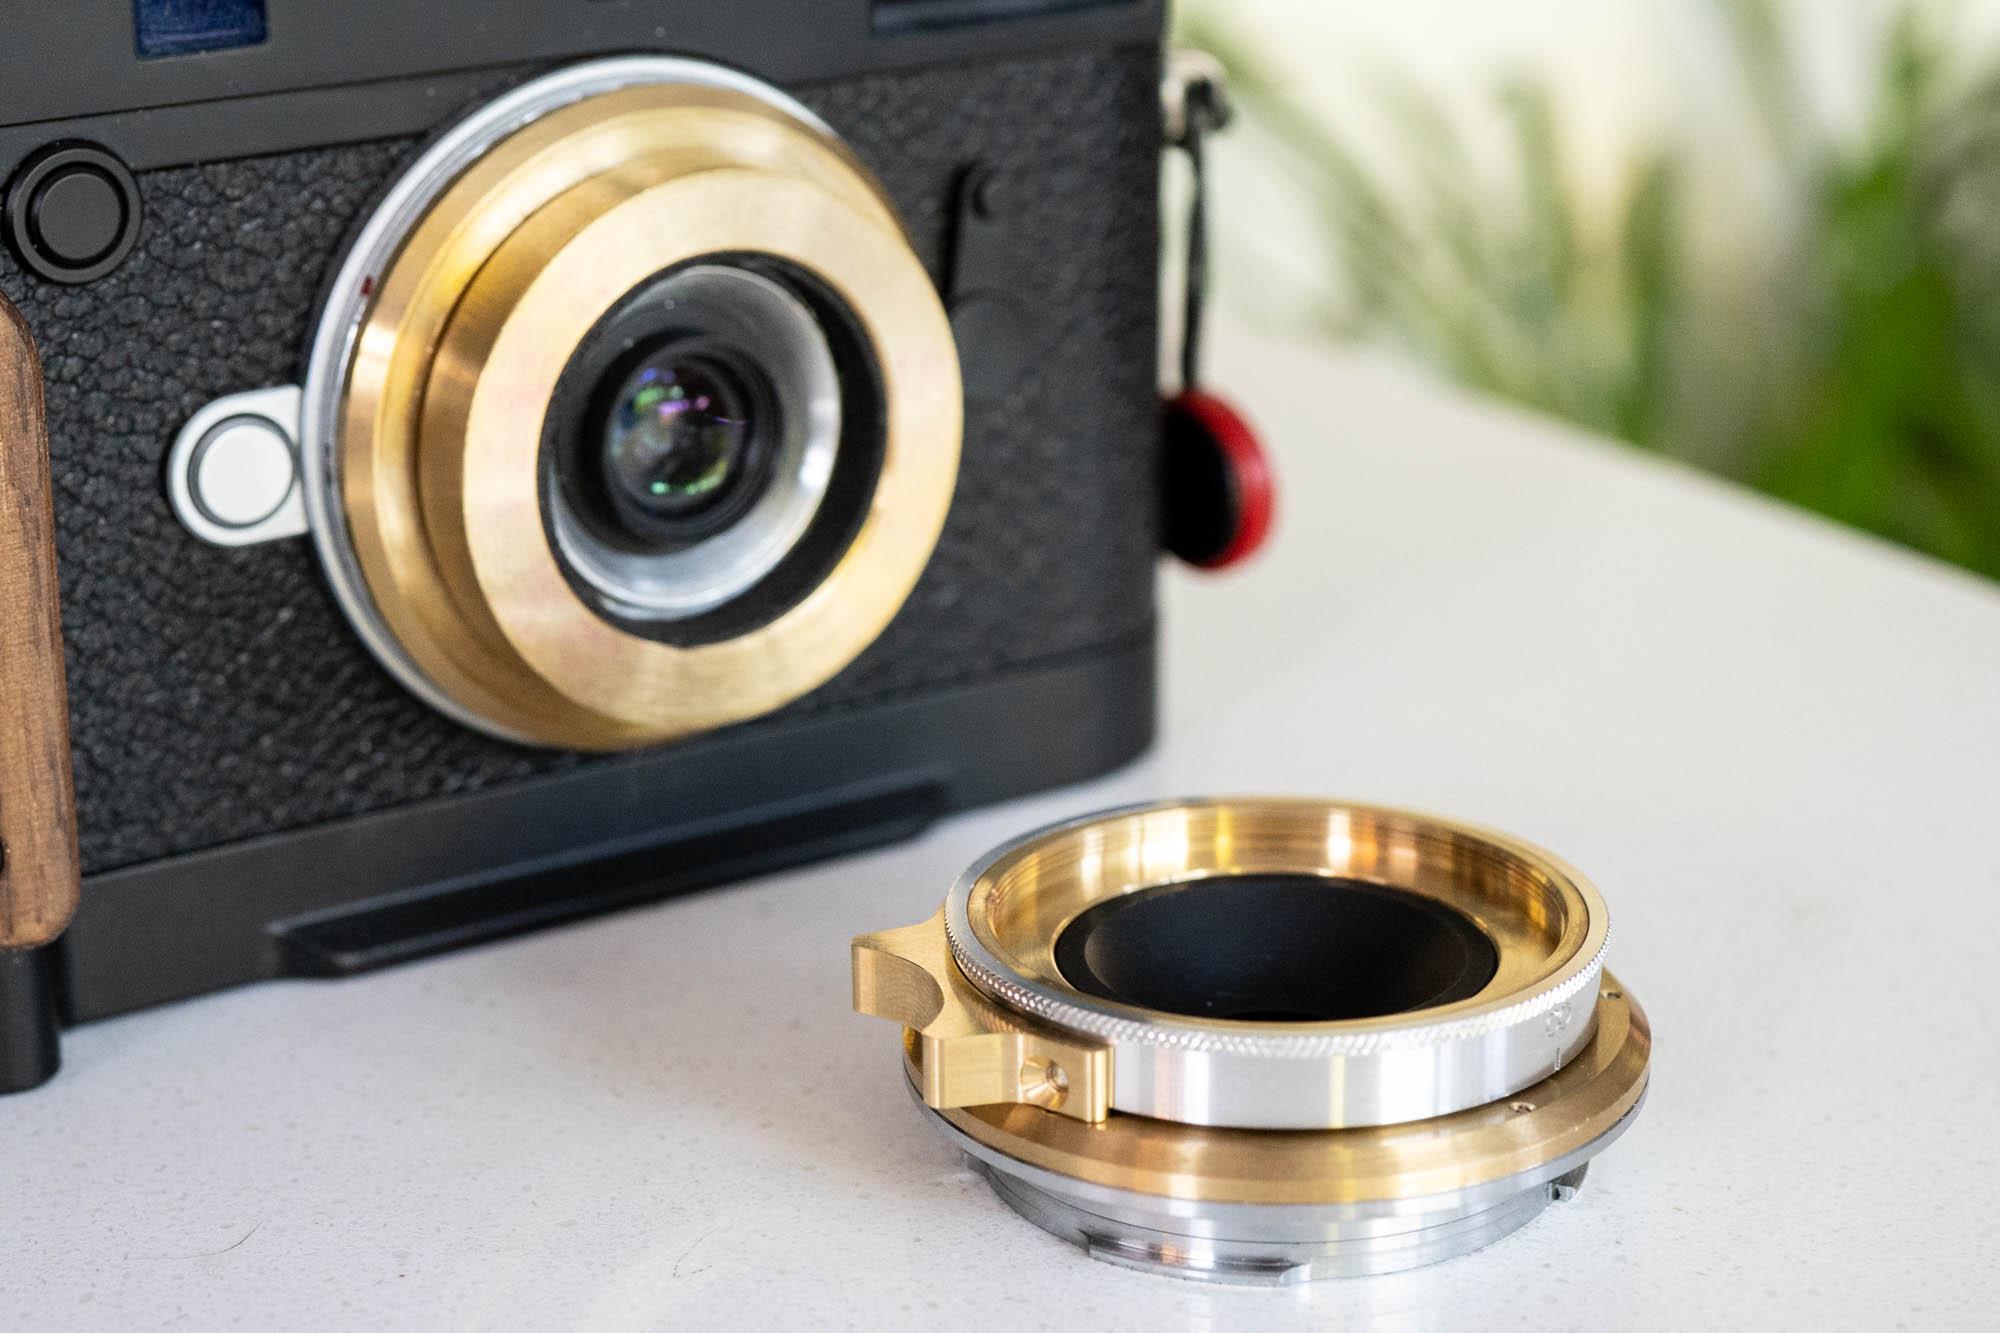 Coming soon: Omnar rangefinder lenses for Leica M-mount - Leica Rumors